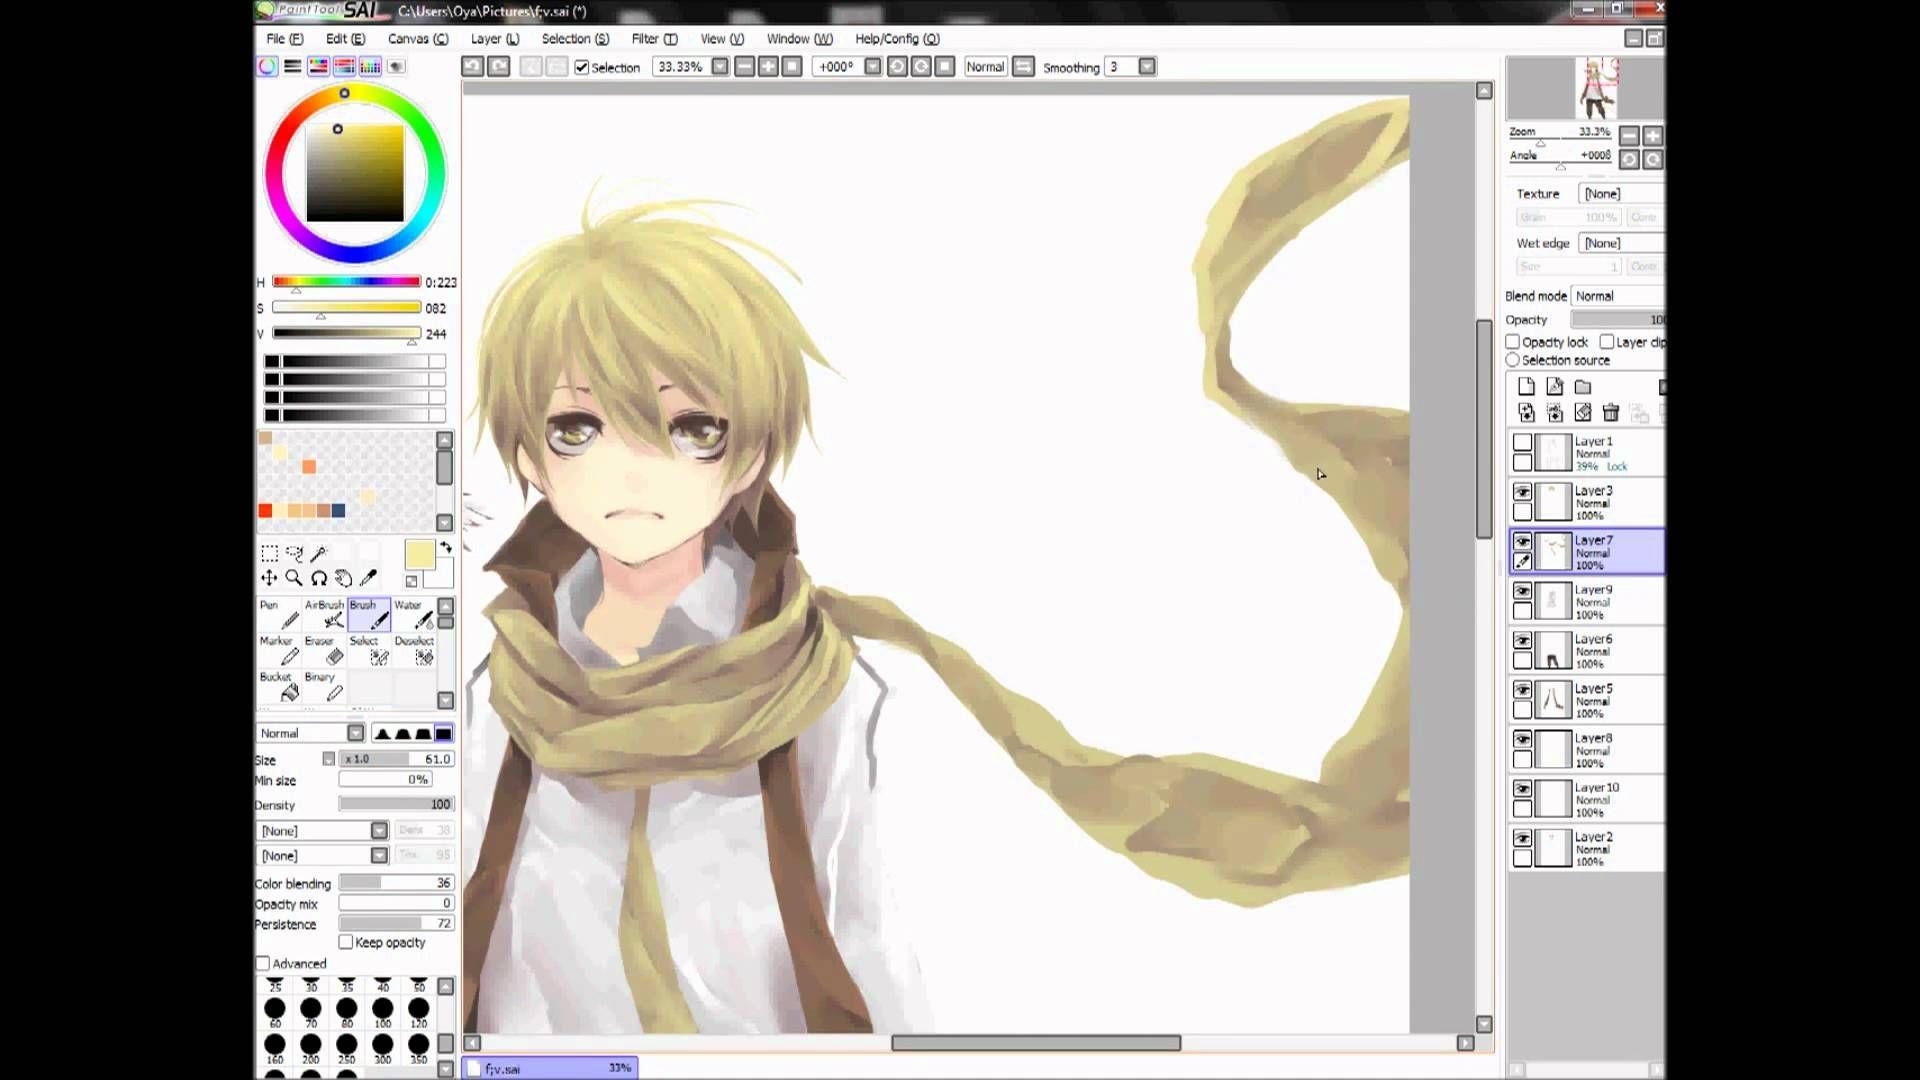 Anime Manga Boy Flavus Drawing With Paint Tool Sai Paint Tool Sai Manga Gift Painting Tools